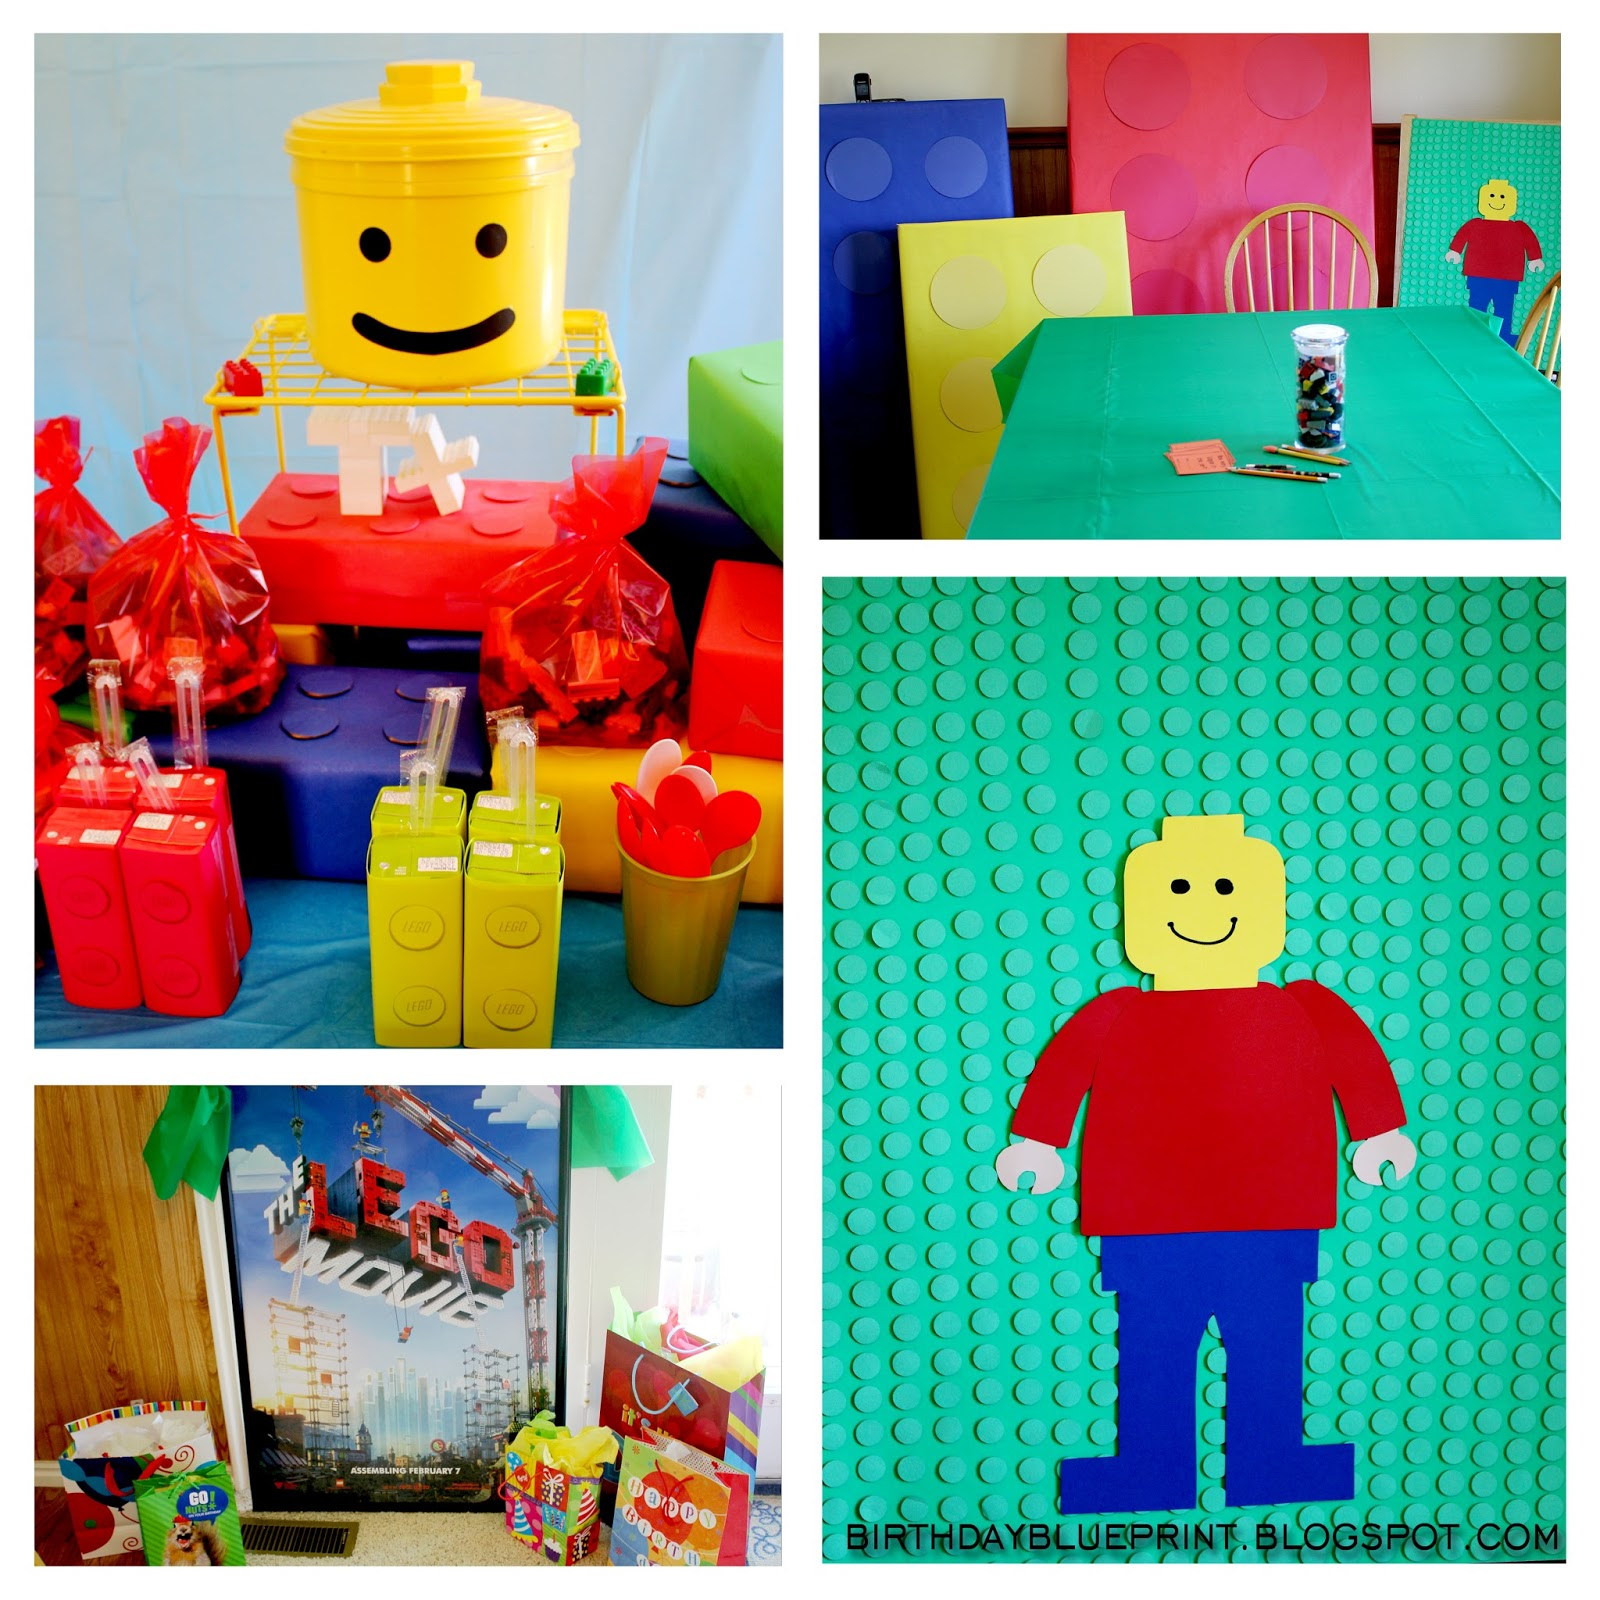 Lego Decorations For Bedroom Lego Bedroom Bedroom Commission Lego Fan Graffiti Art Workshop